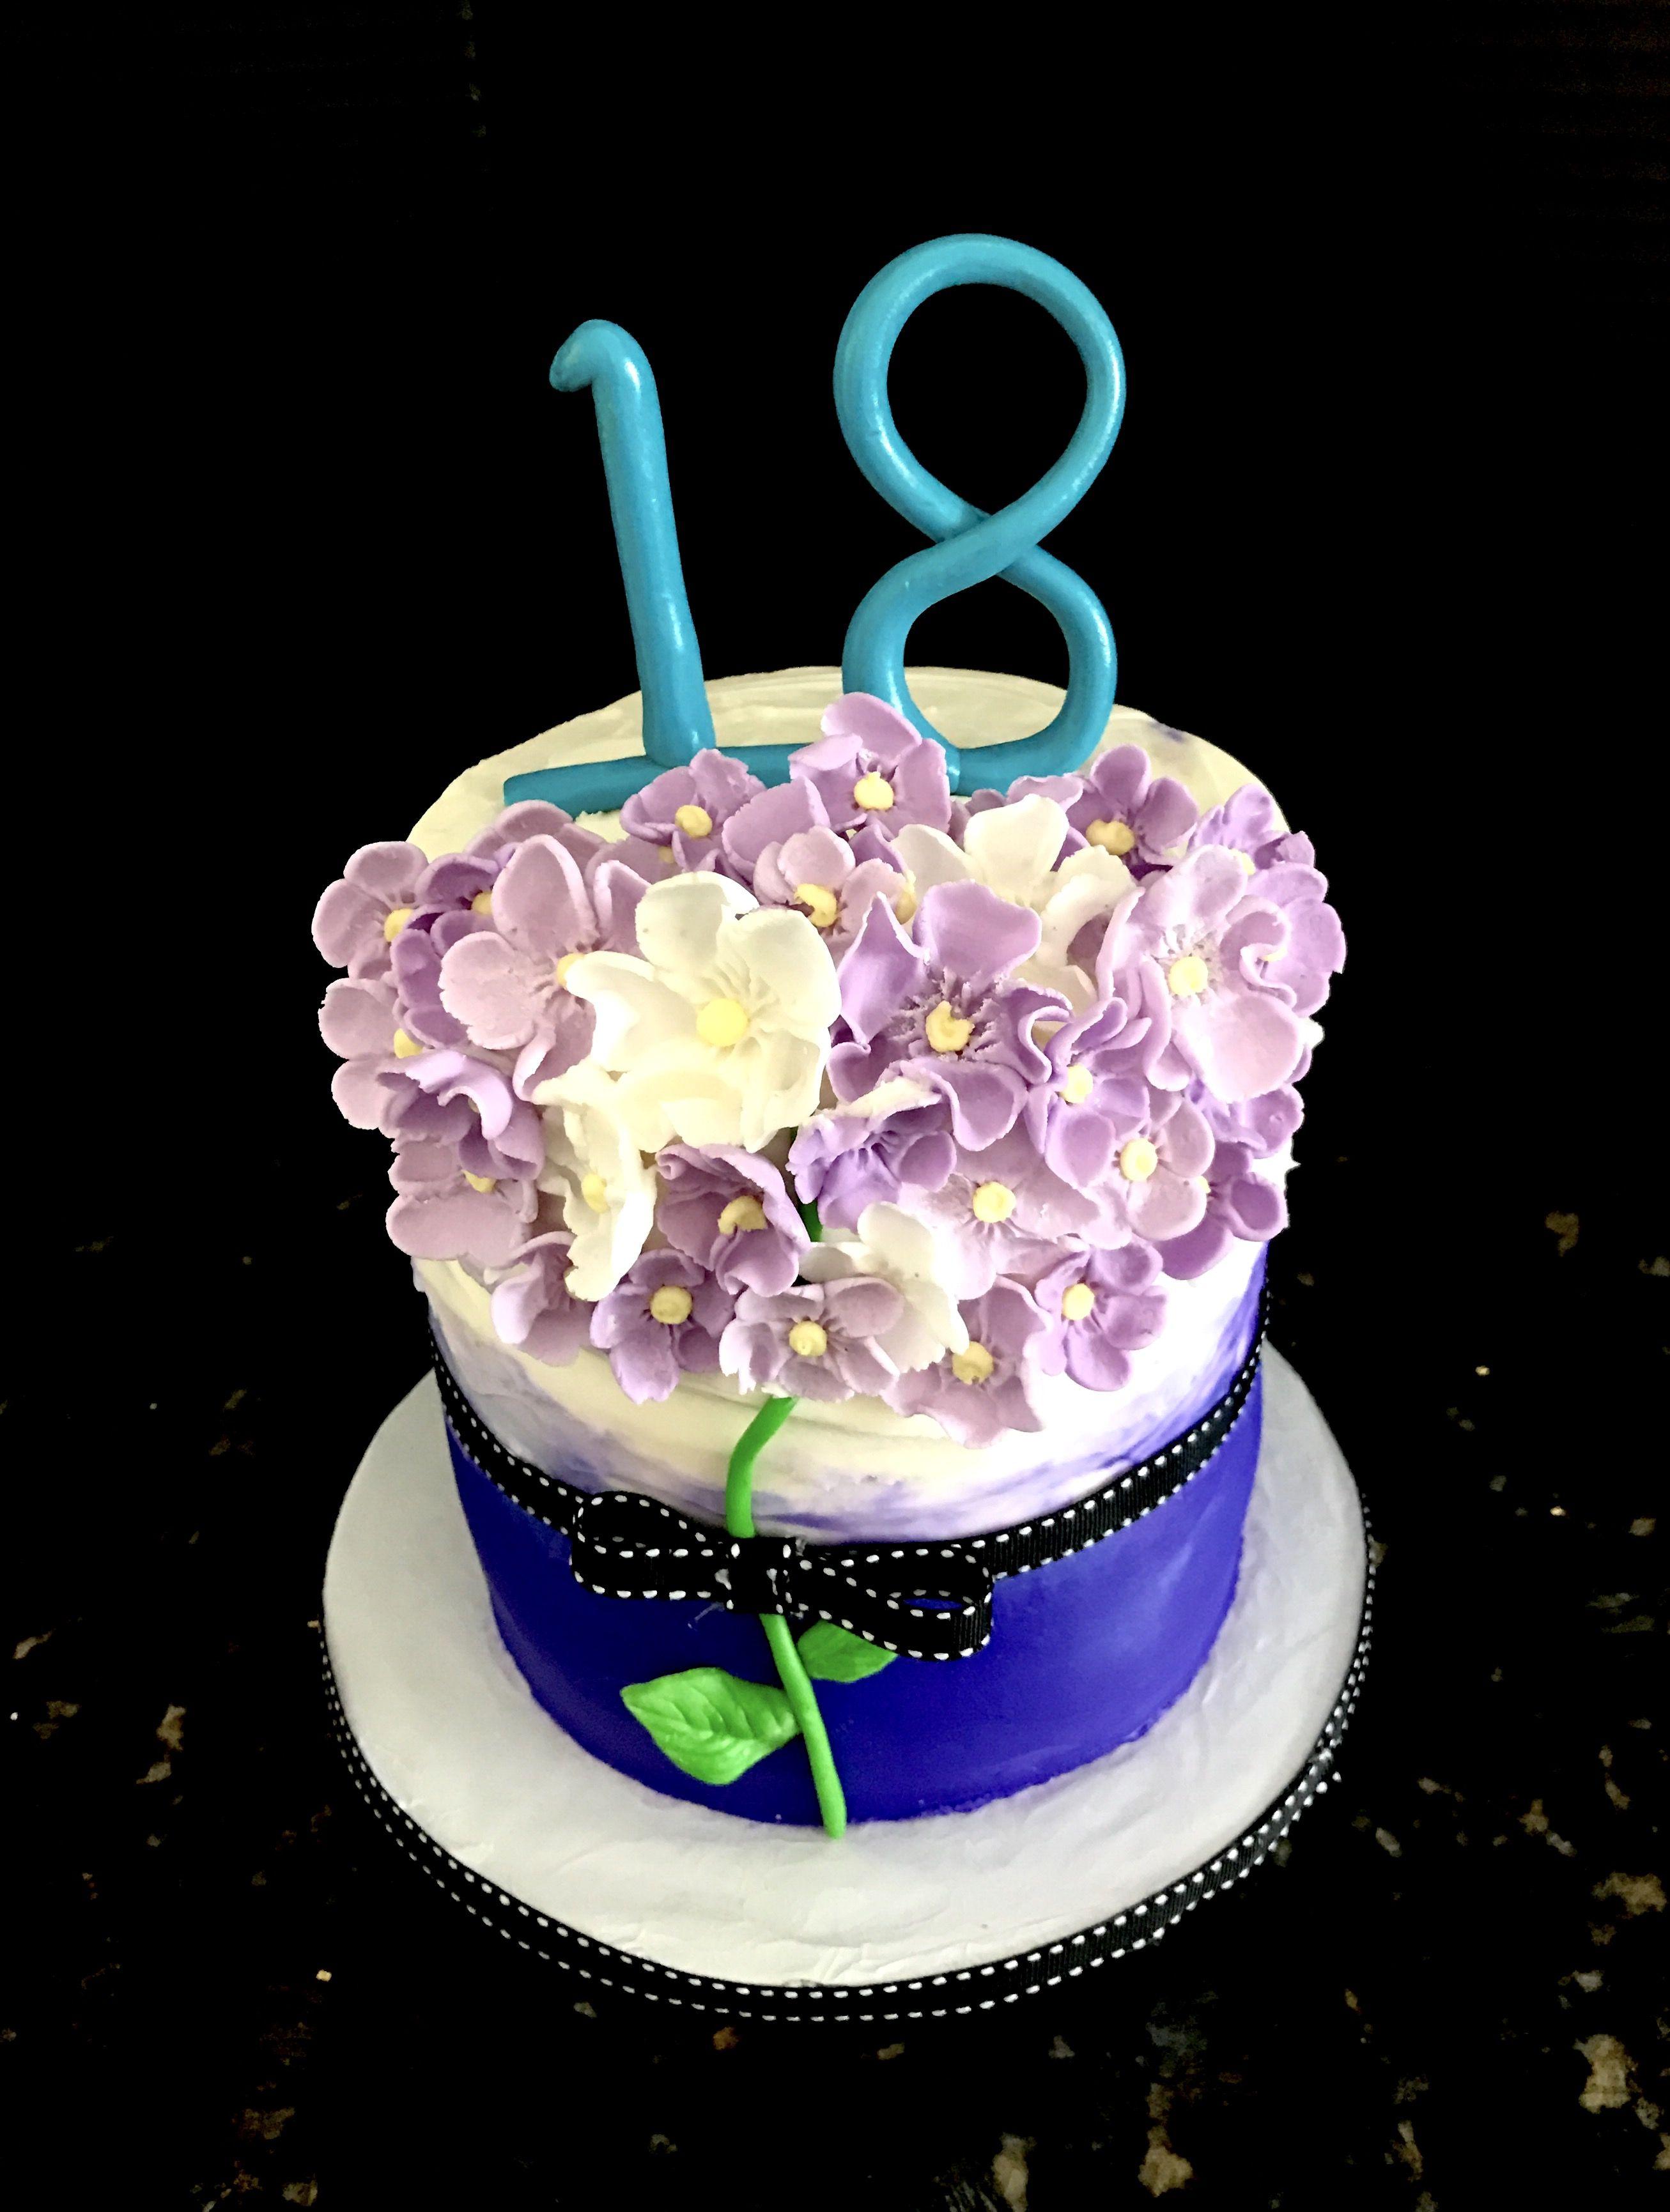 Bouquet of flowers themed happy birthday cake sweet blessings bouquet of flowers themed happy birthday cake izmirmasajfo